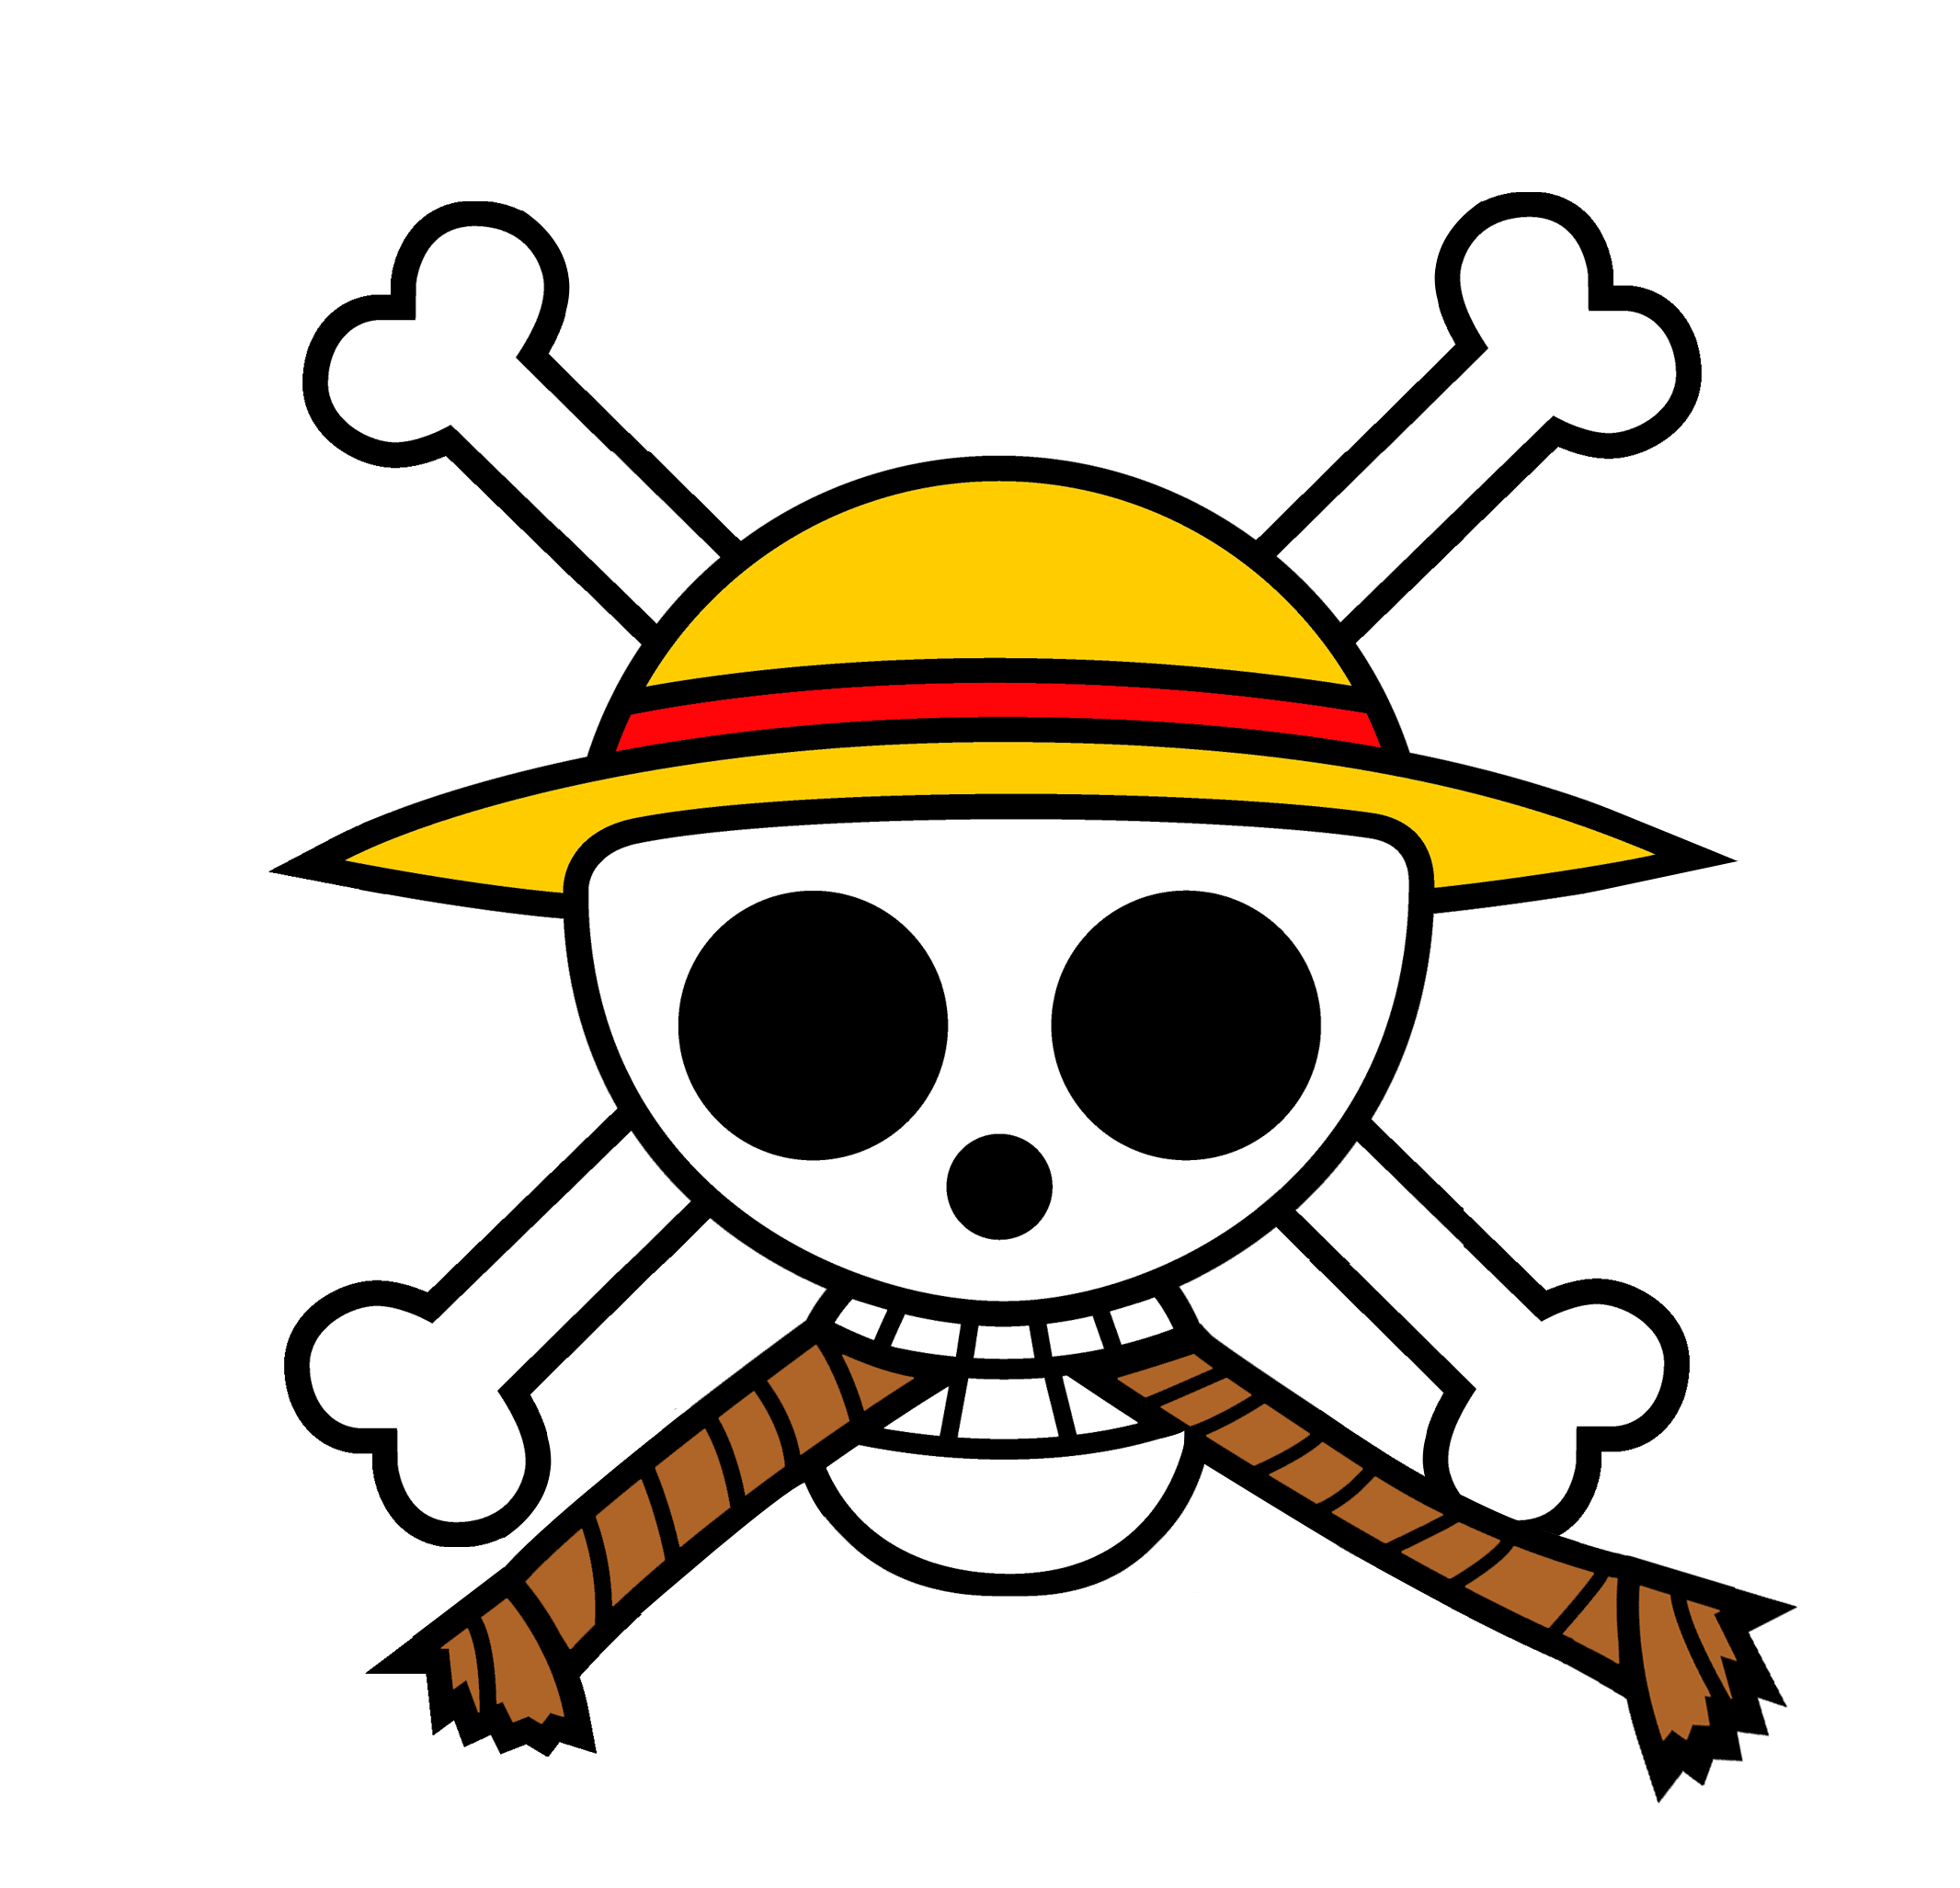 Logo One Piece Vector - ClipArt Best